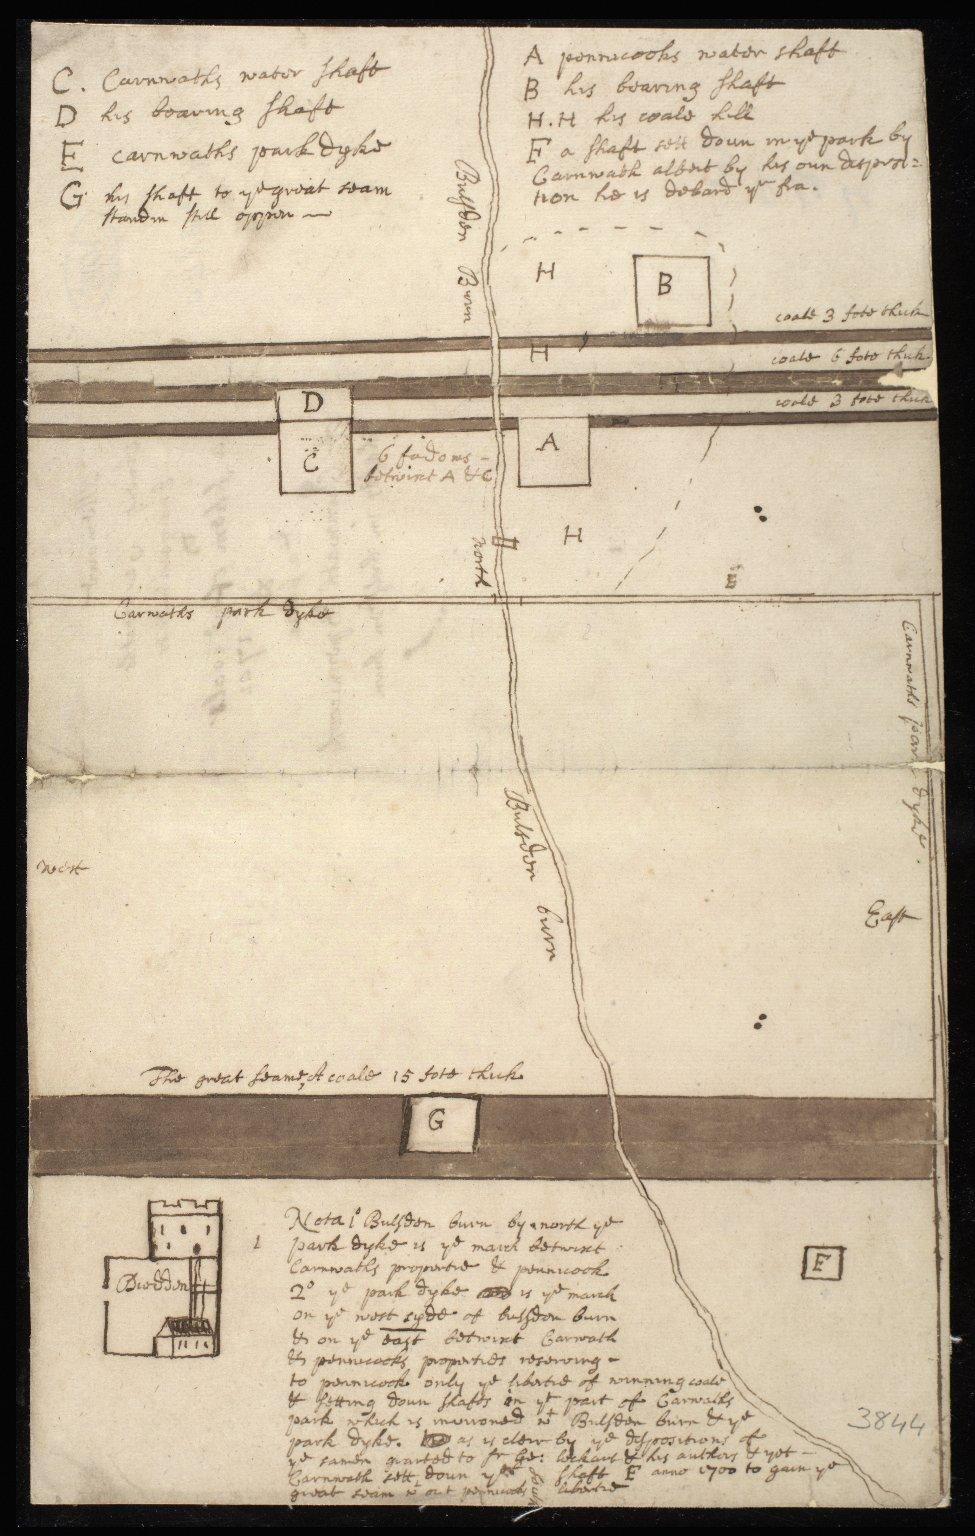 Memoir Anent Carnwaths Encroachments & a schem of coals 1701 [1 of 1]